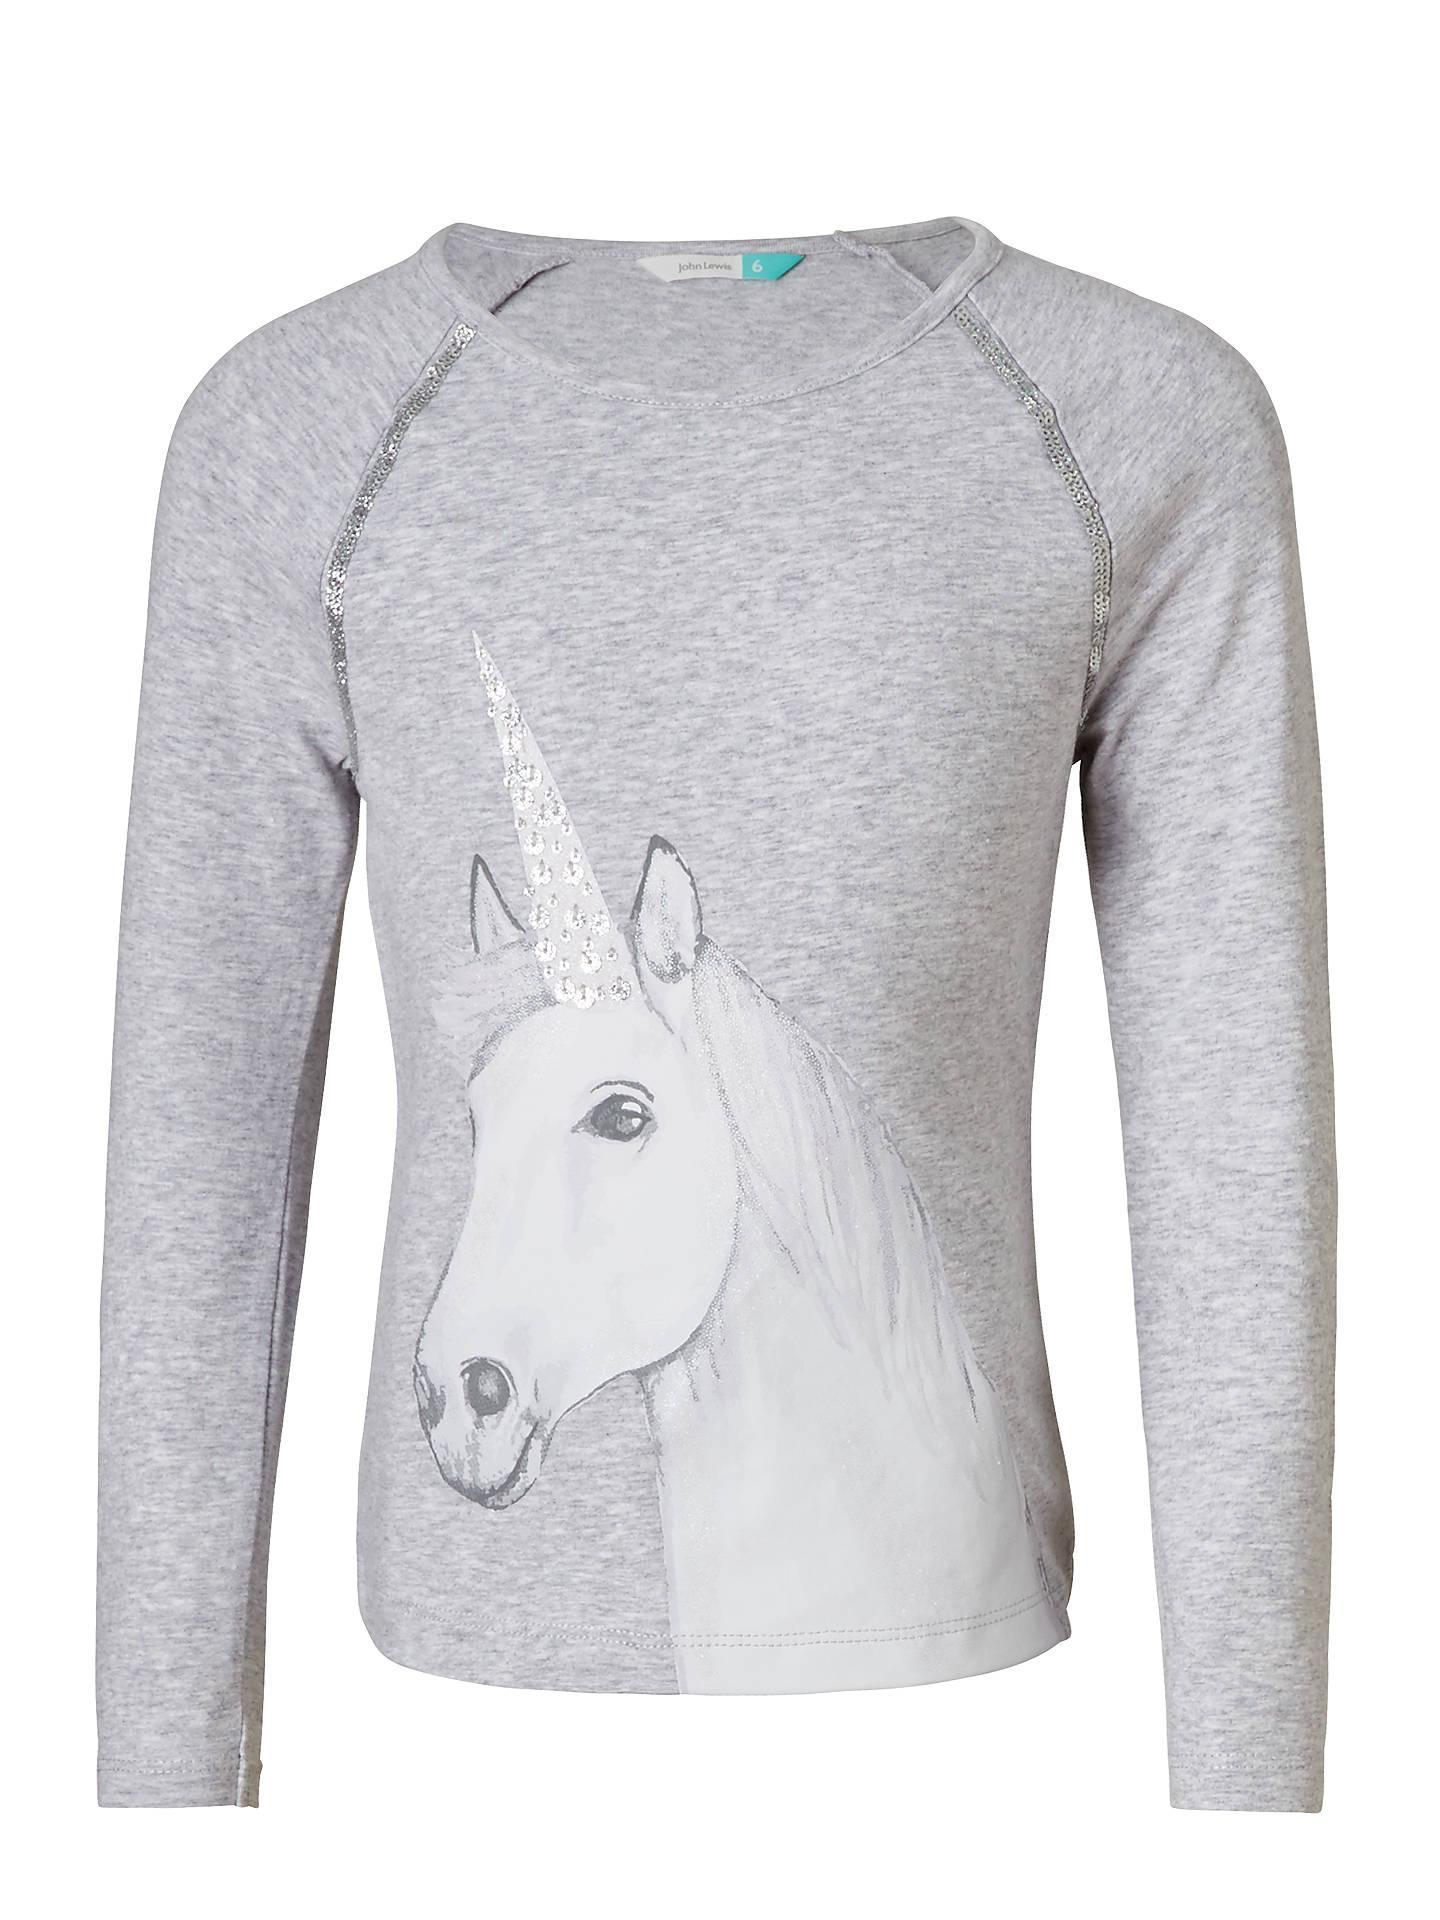 3f004ea0 John Lewis Girls' Unicorn T-Shirt, Grey Marl at John Lewis & Partners